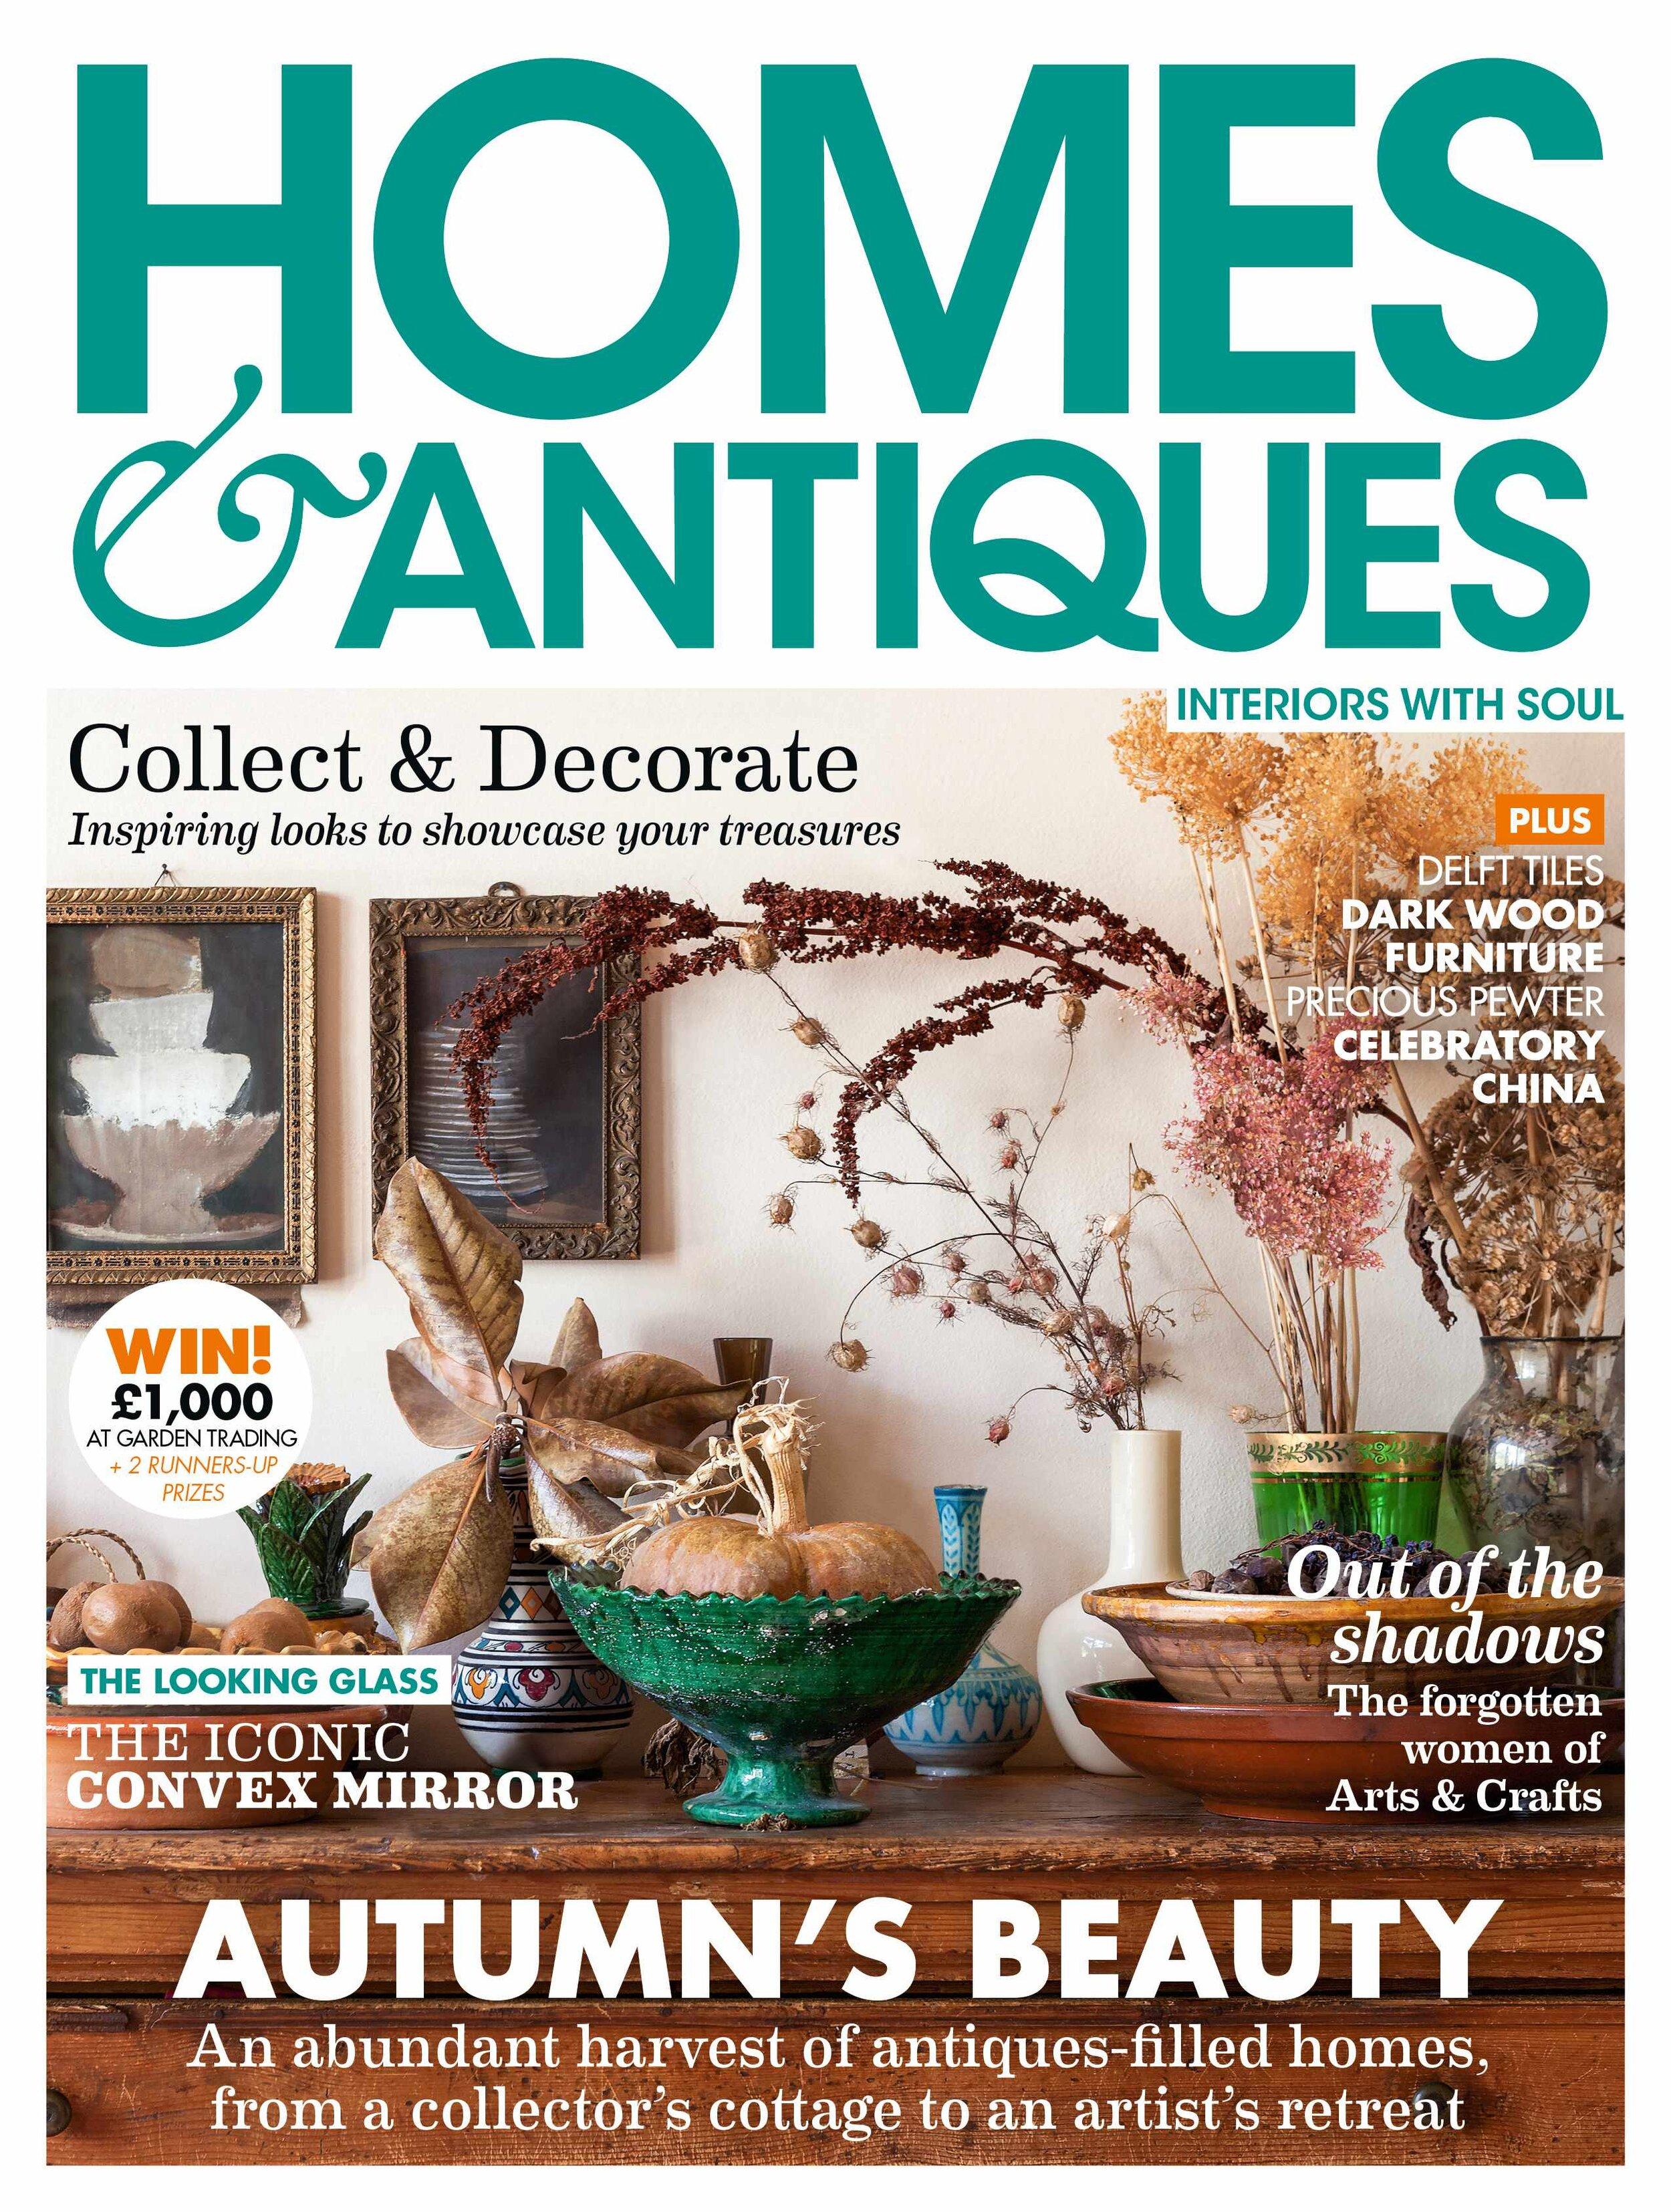 Homes & Antiques - 1/10/19